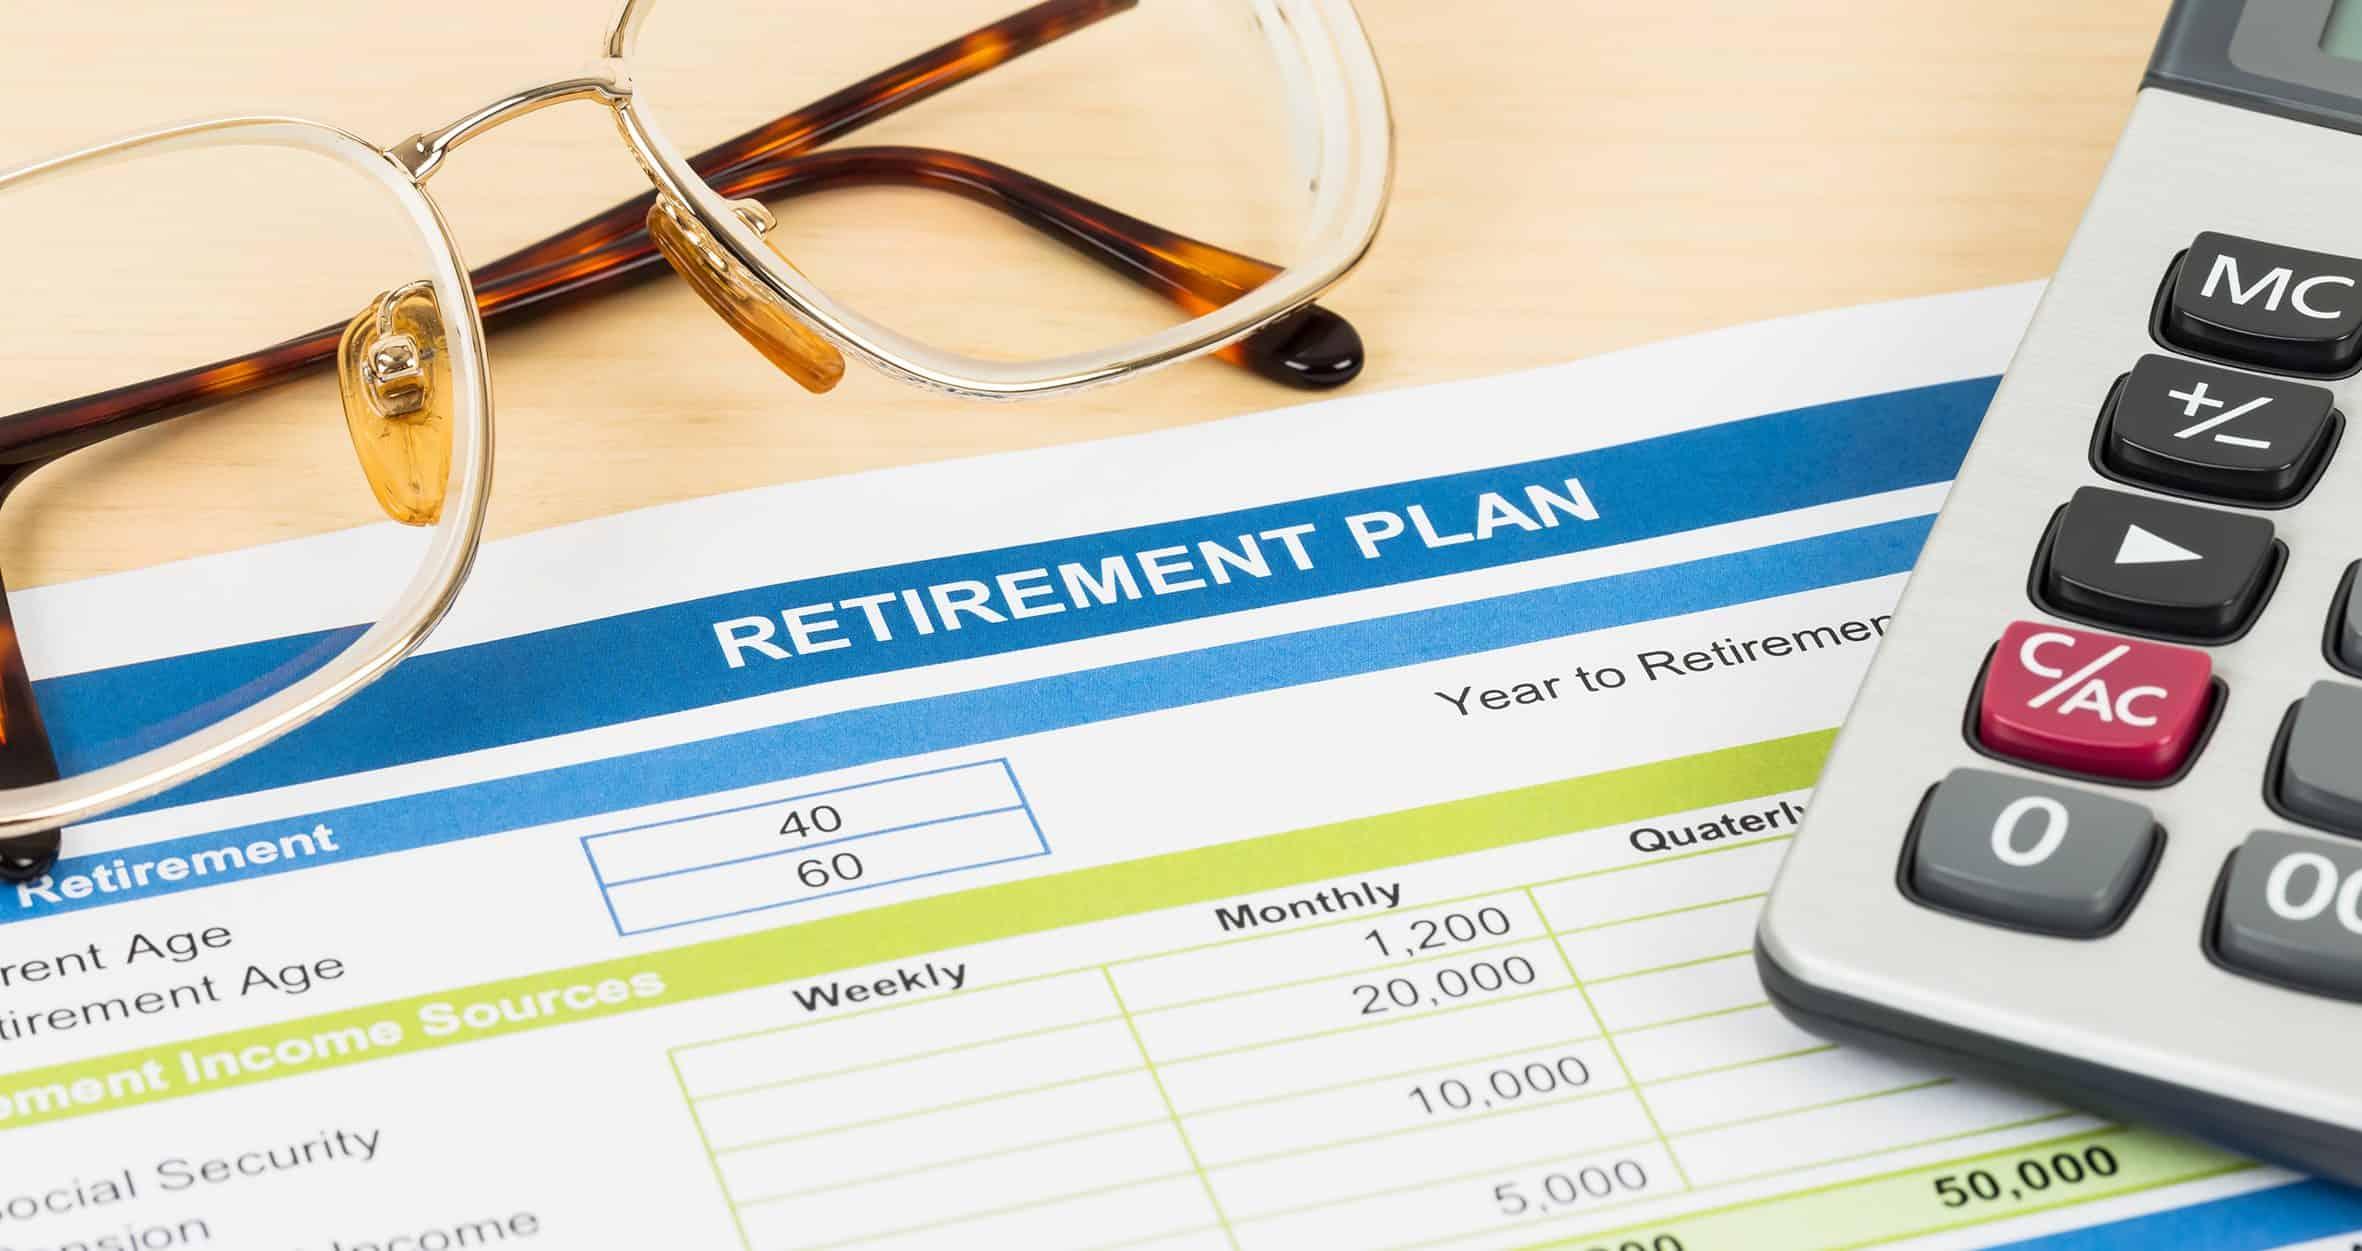 Mis-sold Pension Claim | Get your compensation ...